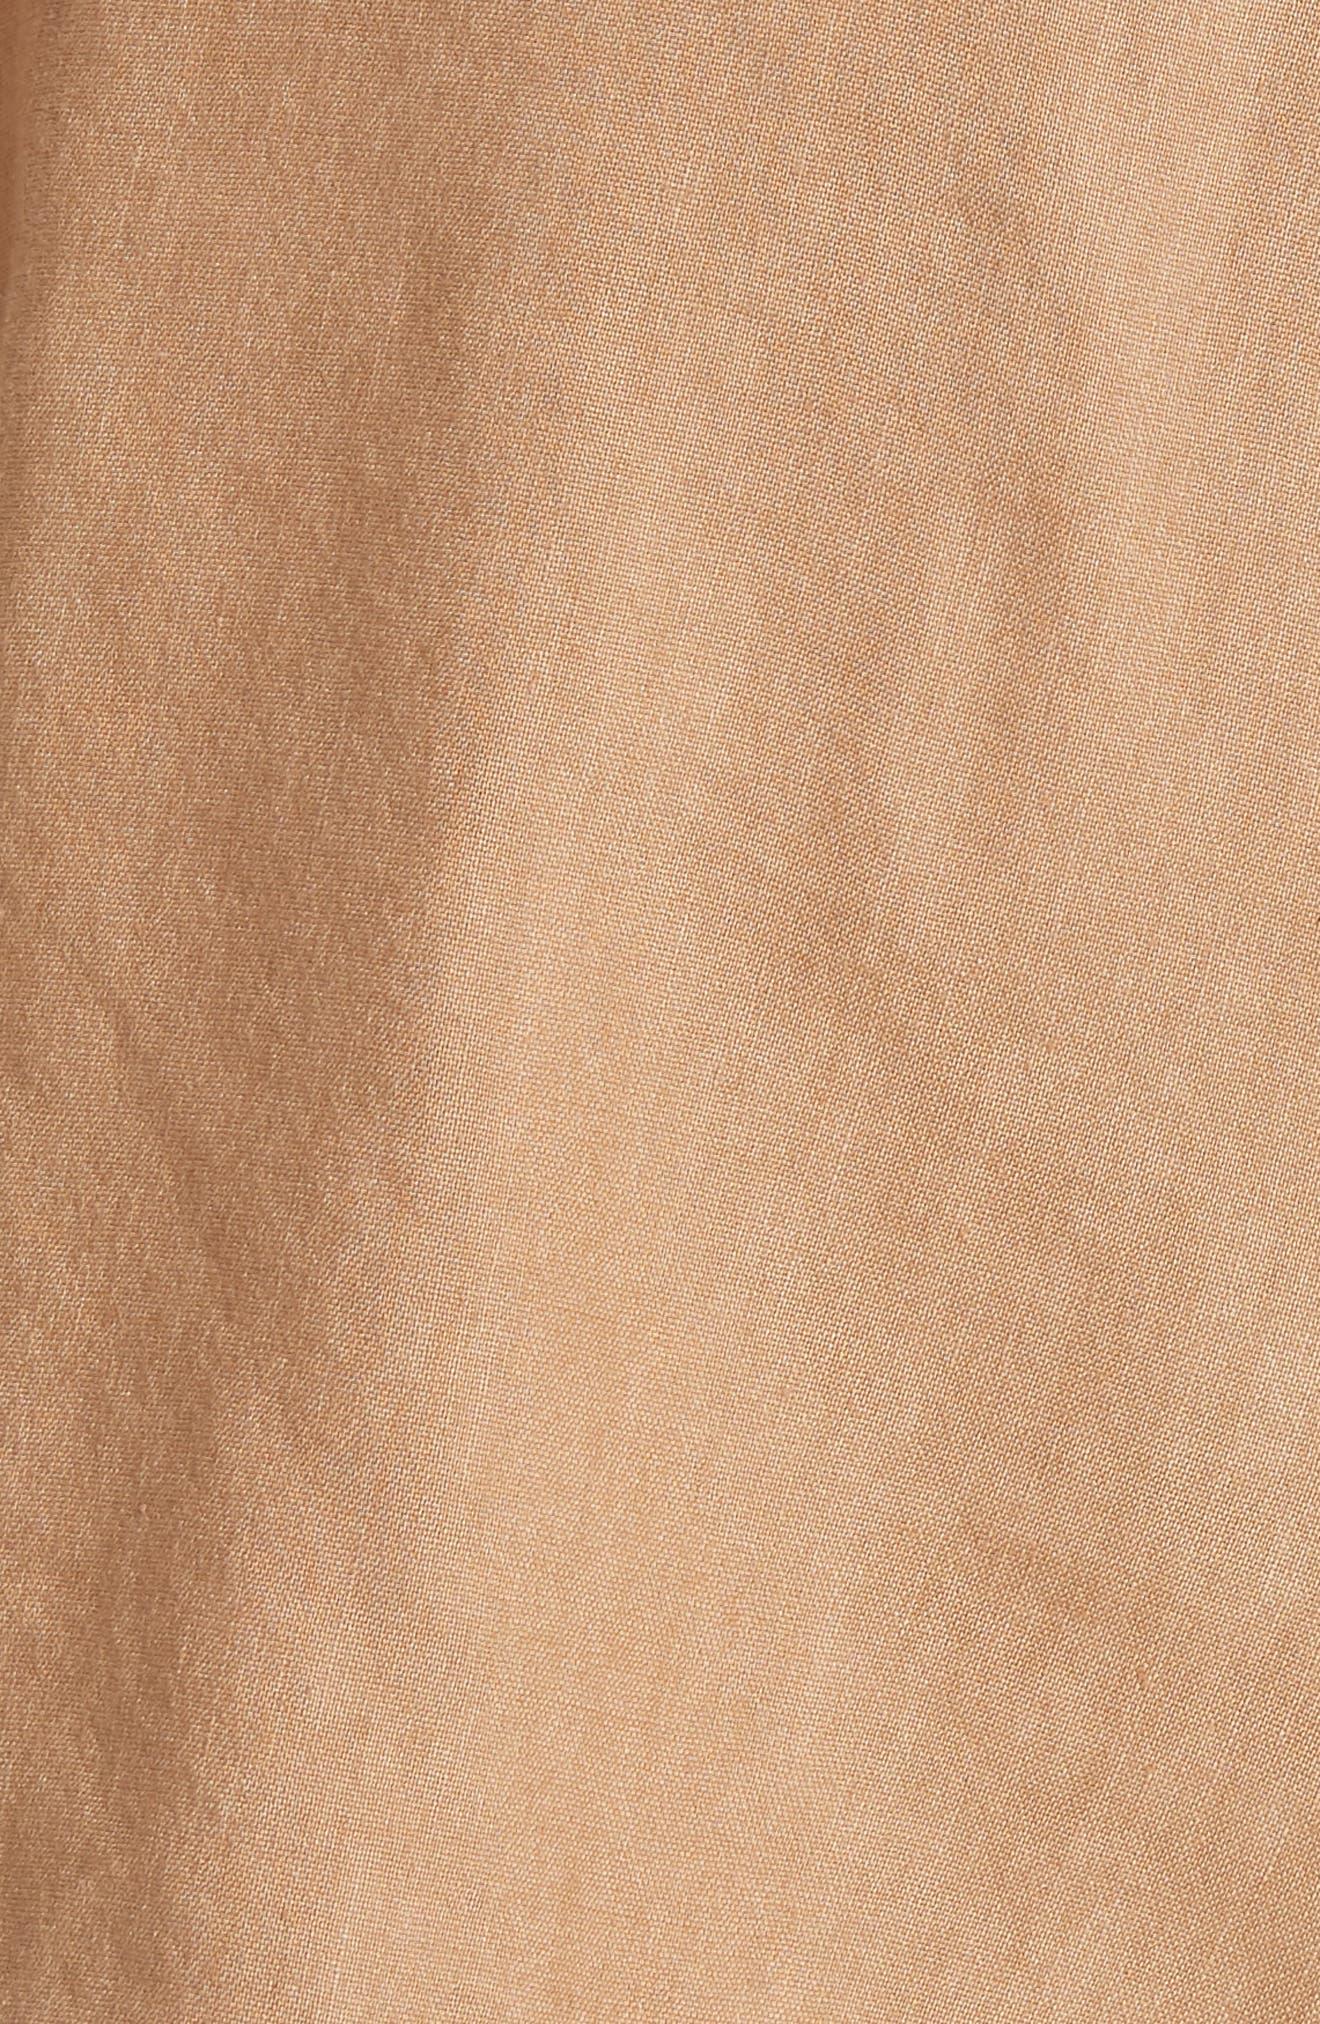 Dawson Flutter Tie Waist Linen Blend Shorts,                             Alternate thumbnail 5, color,                             276